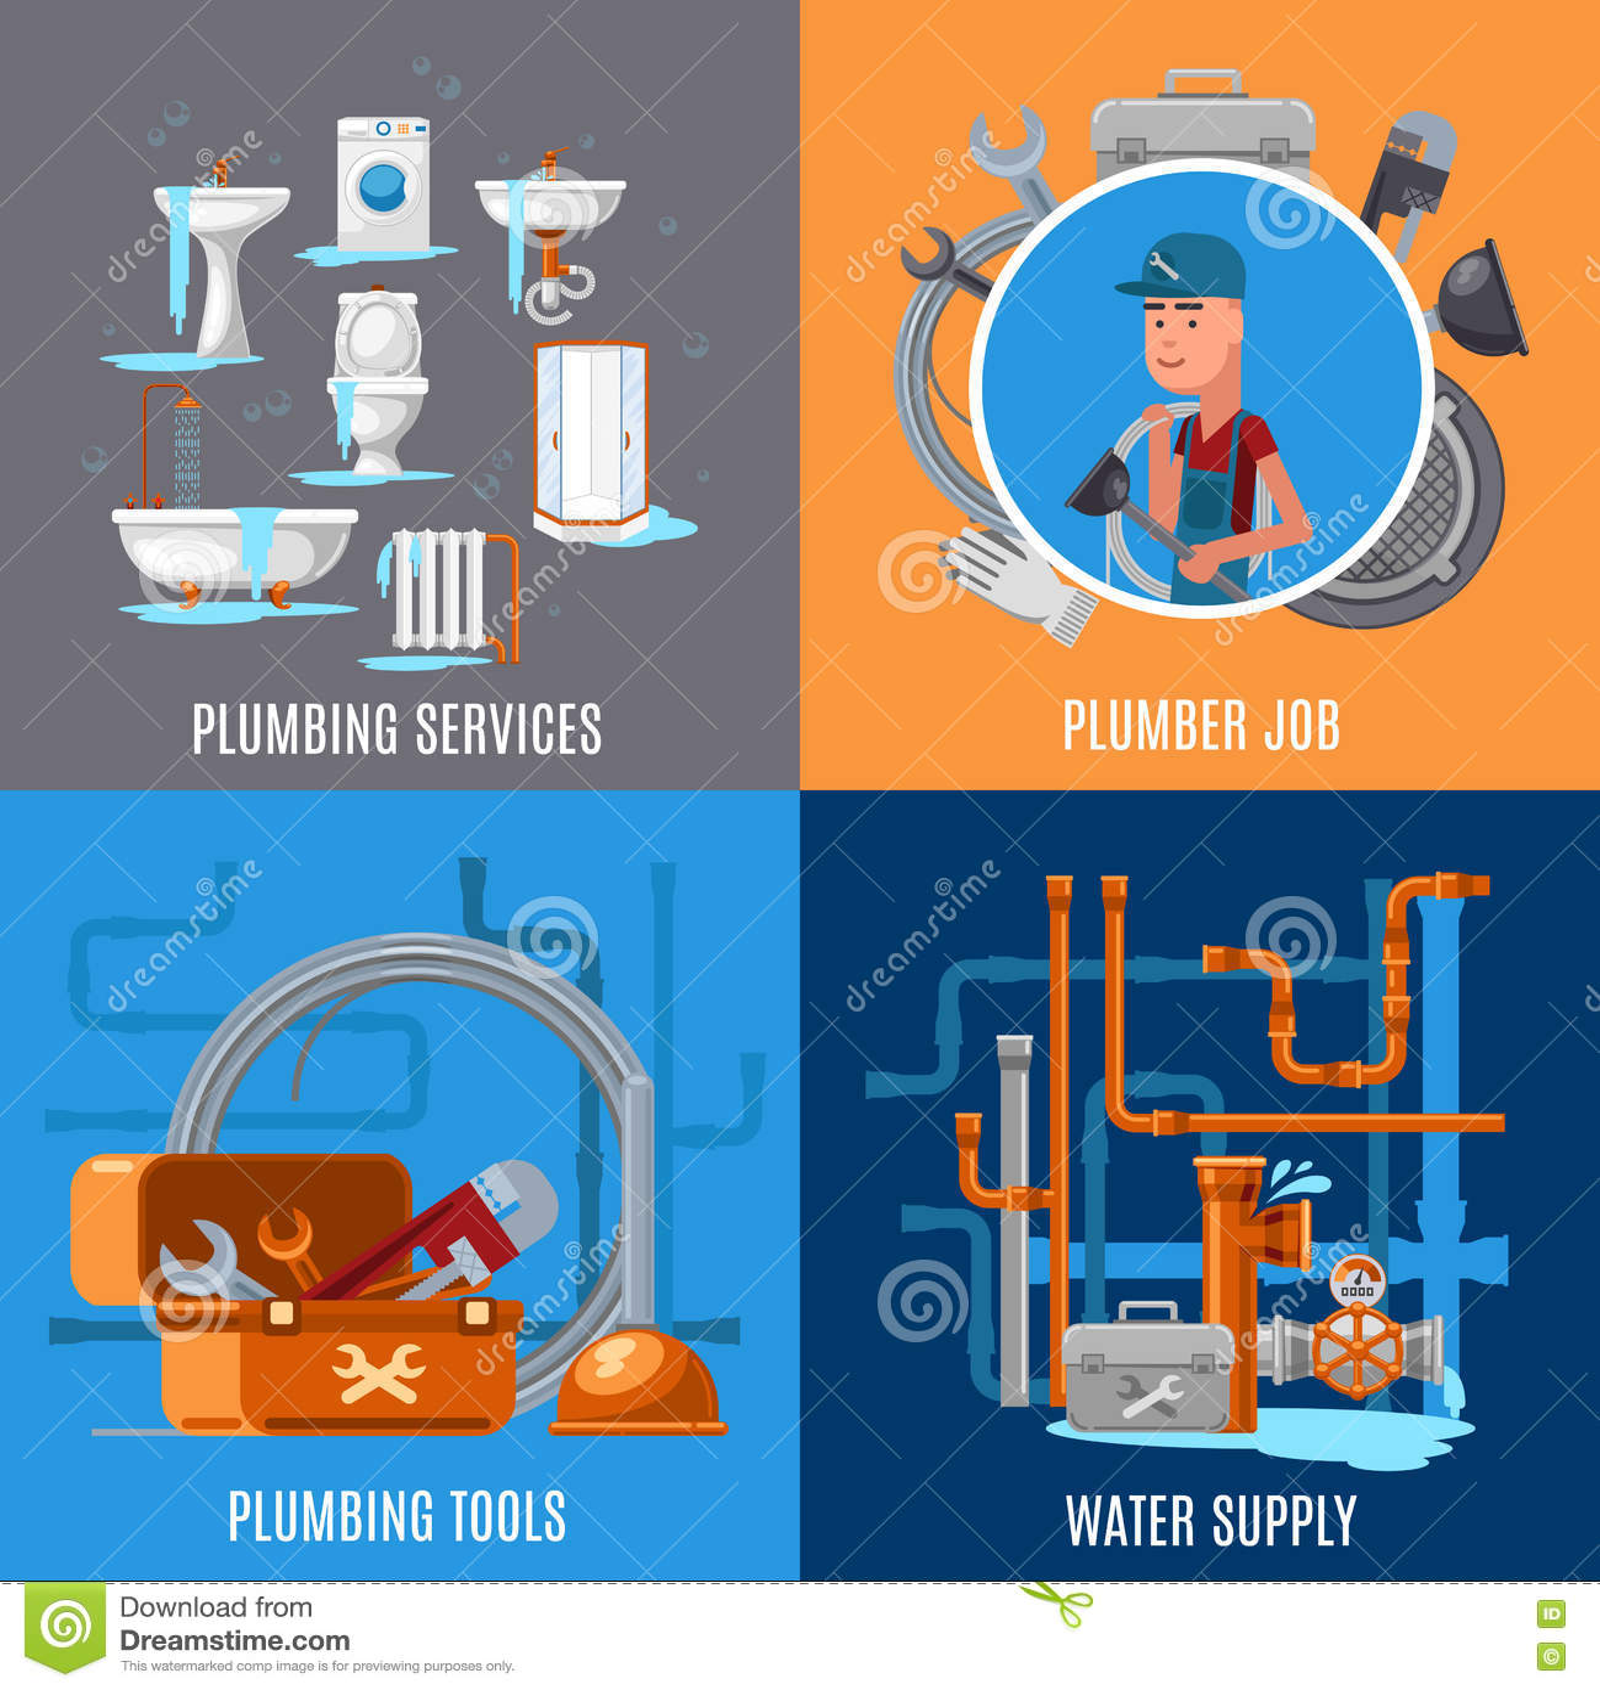 Vector E Sanitary Service : Fix cartoons illustrations vector stock images